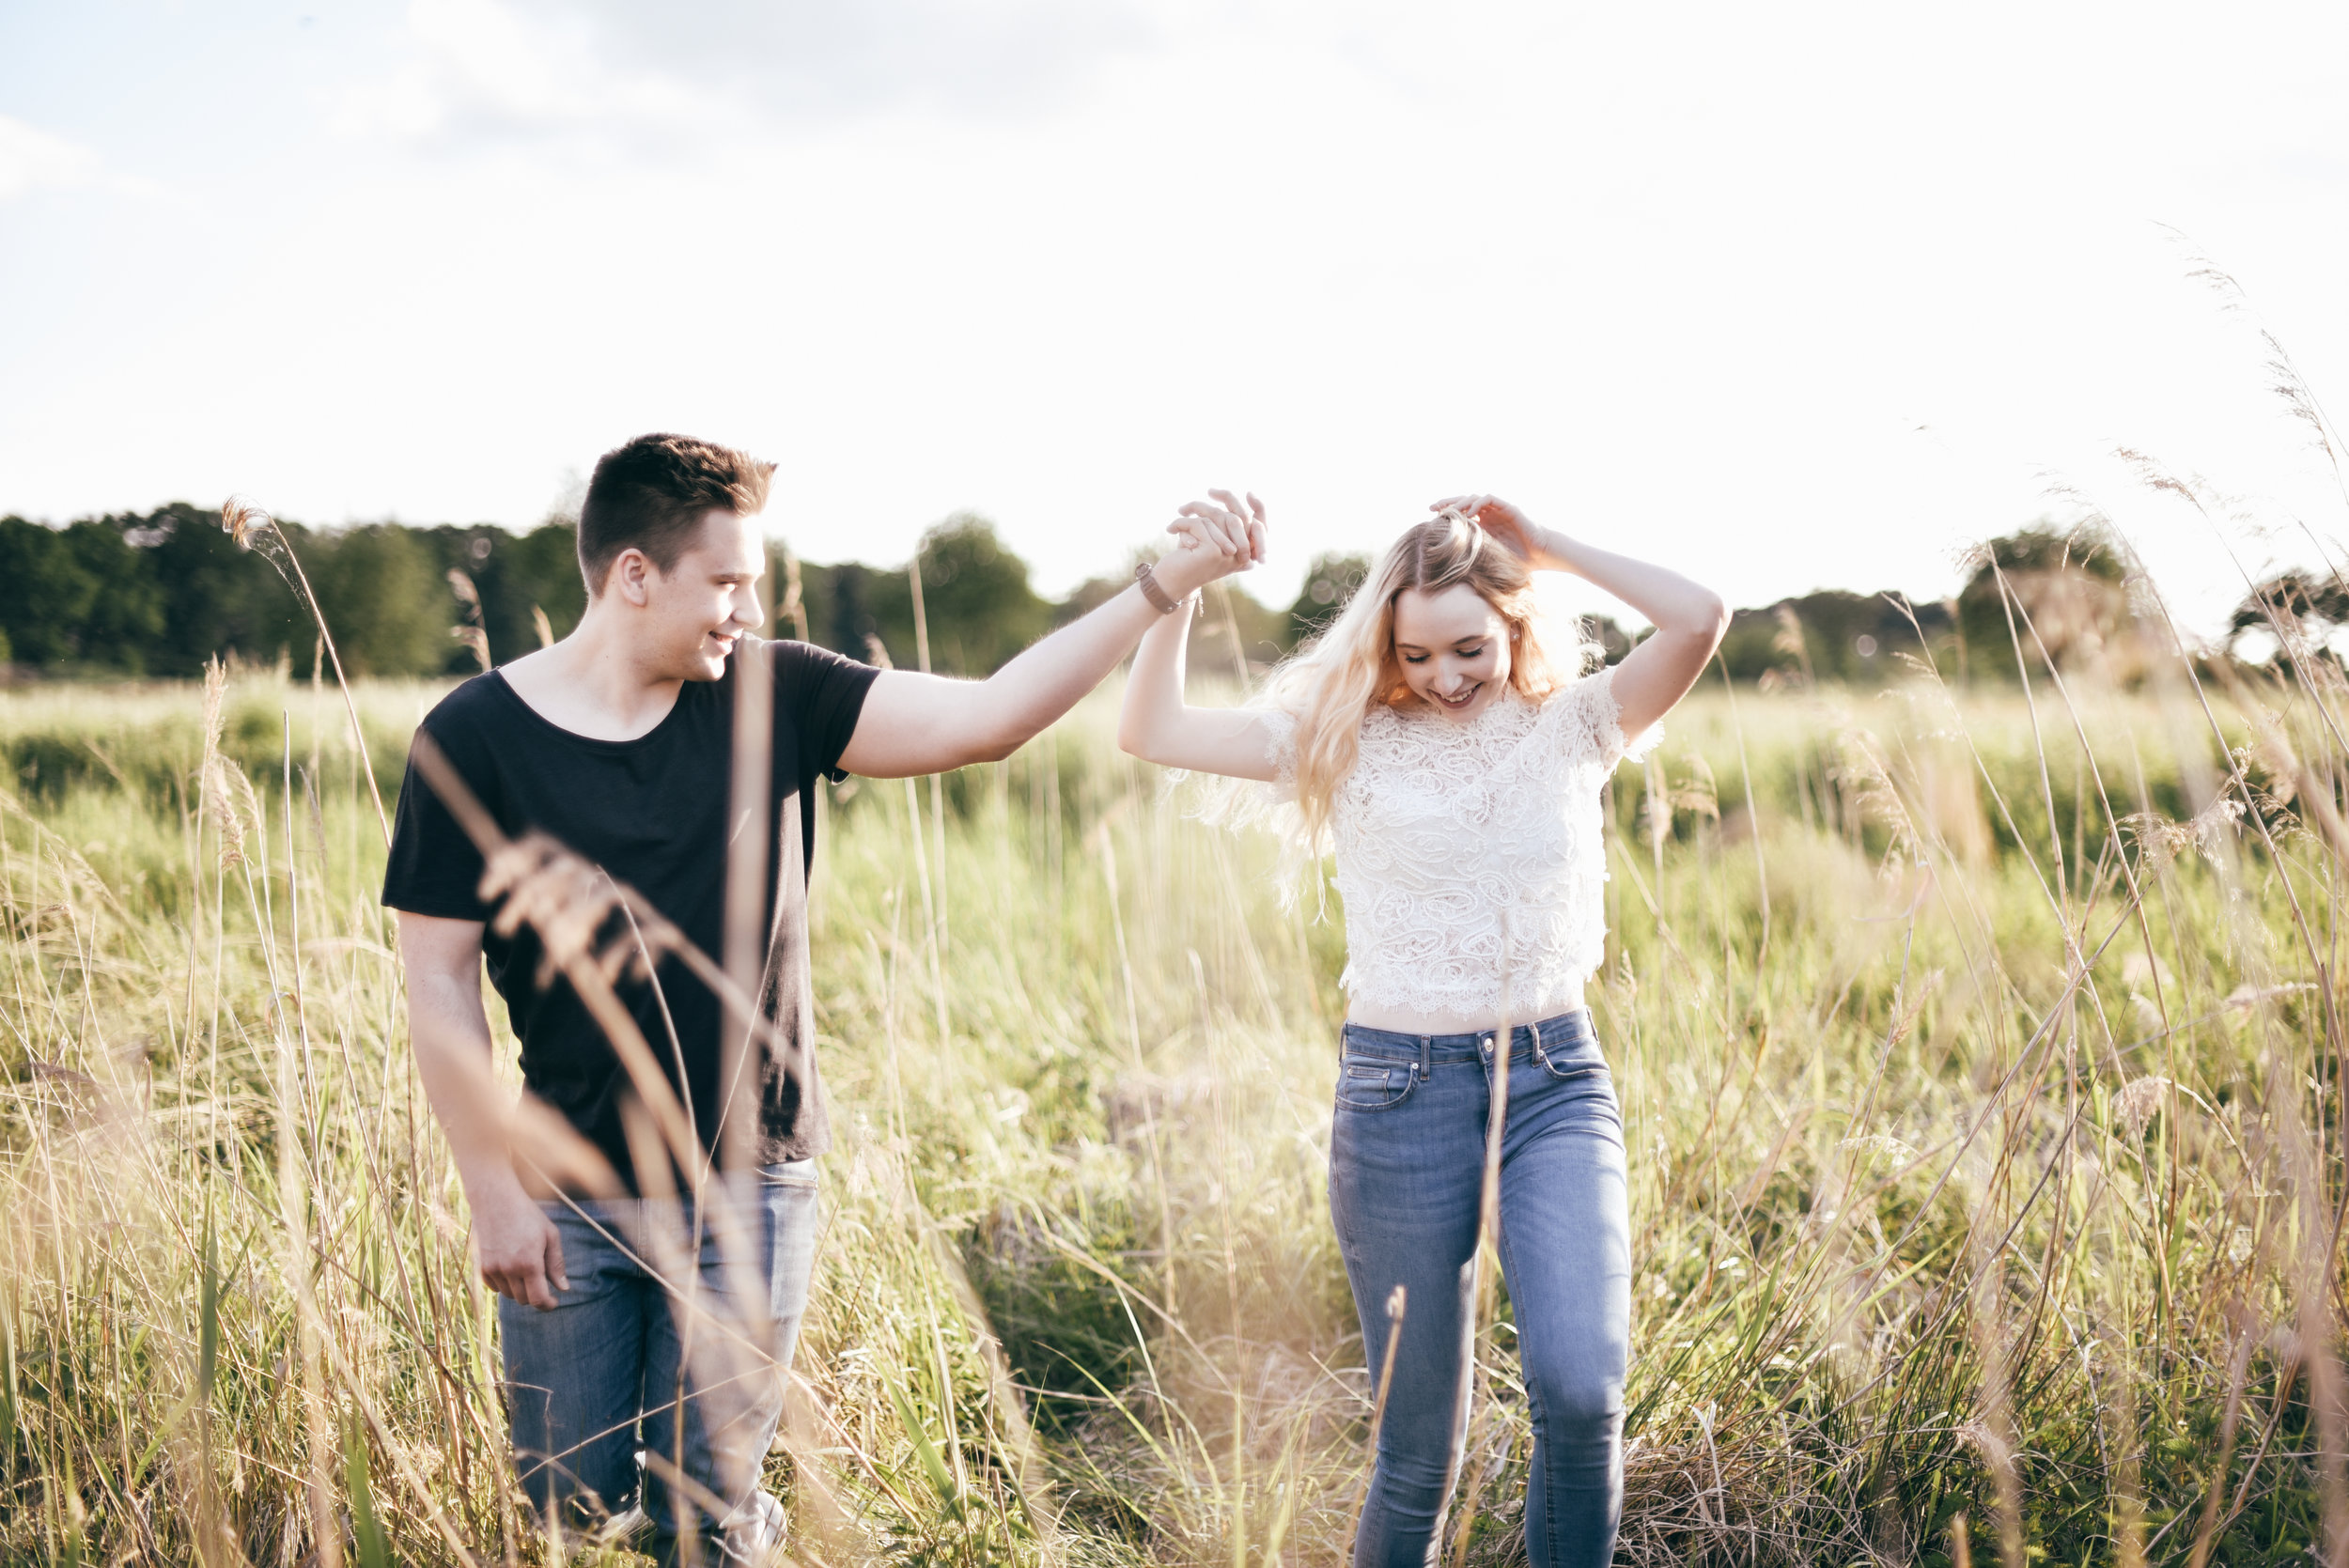 photography-fotografin-münster-shooting-pärchen-couple-natural-natürlich-goldenhour-shooting-blogger-instagram-inspiration